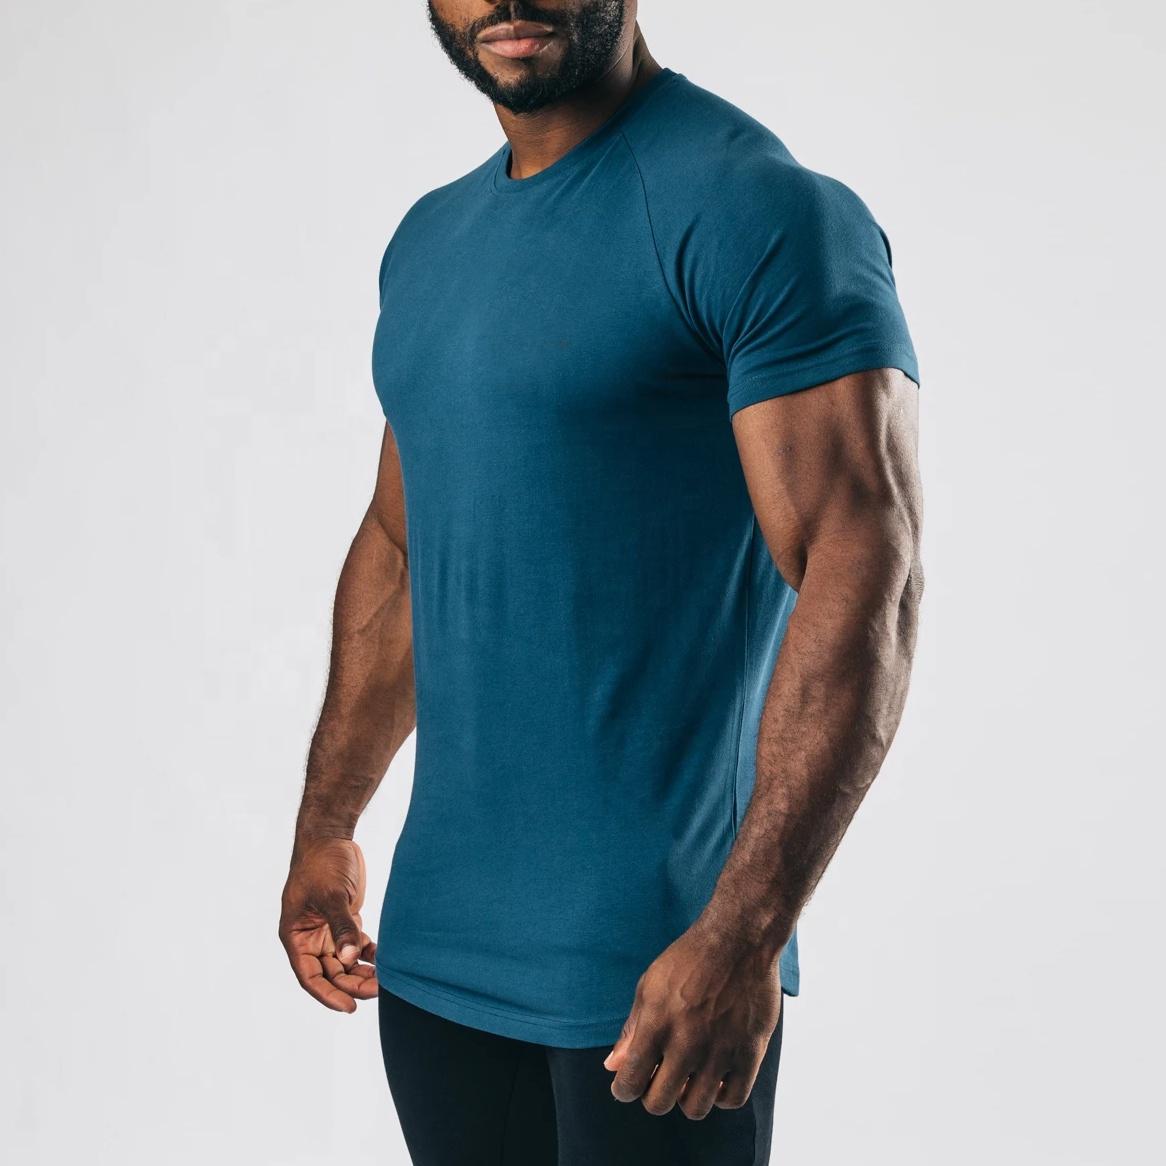 95% Cotton 5% Spandex Mens Performance T Shirt Sport Short Sleeve Raglan Tee custom gym t shirt